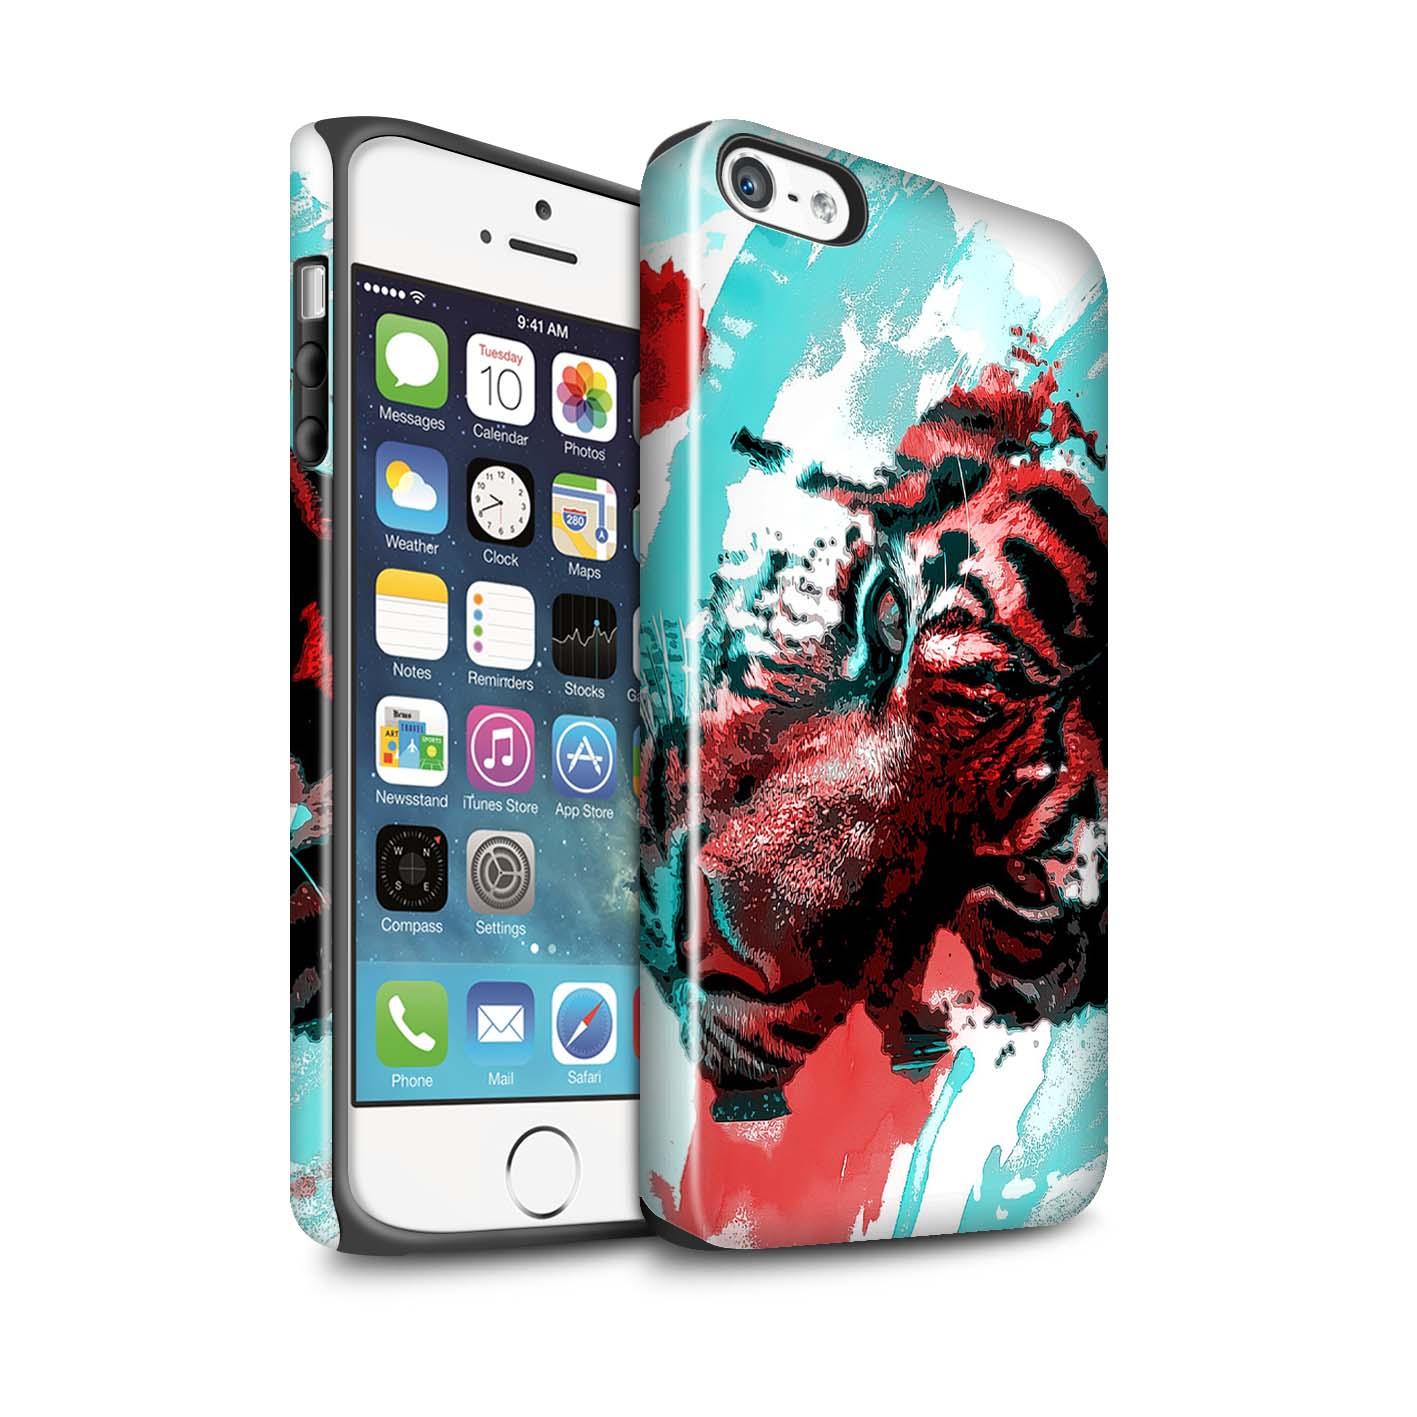 Robuste-Brillant-Antichoc-Etui-STUFF4-pour-Apple-iPhone-5-5S-Fragments